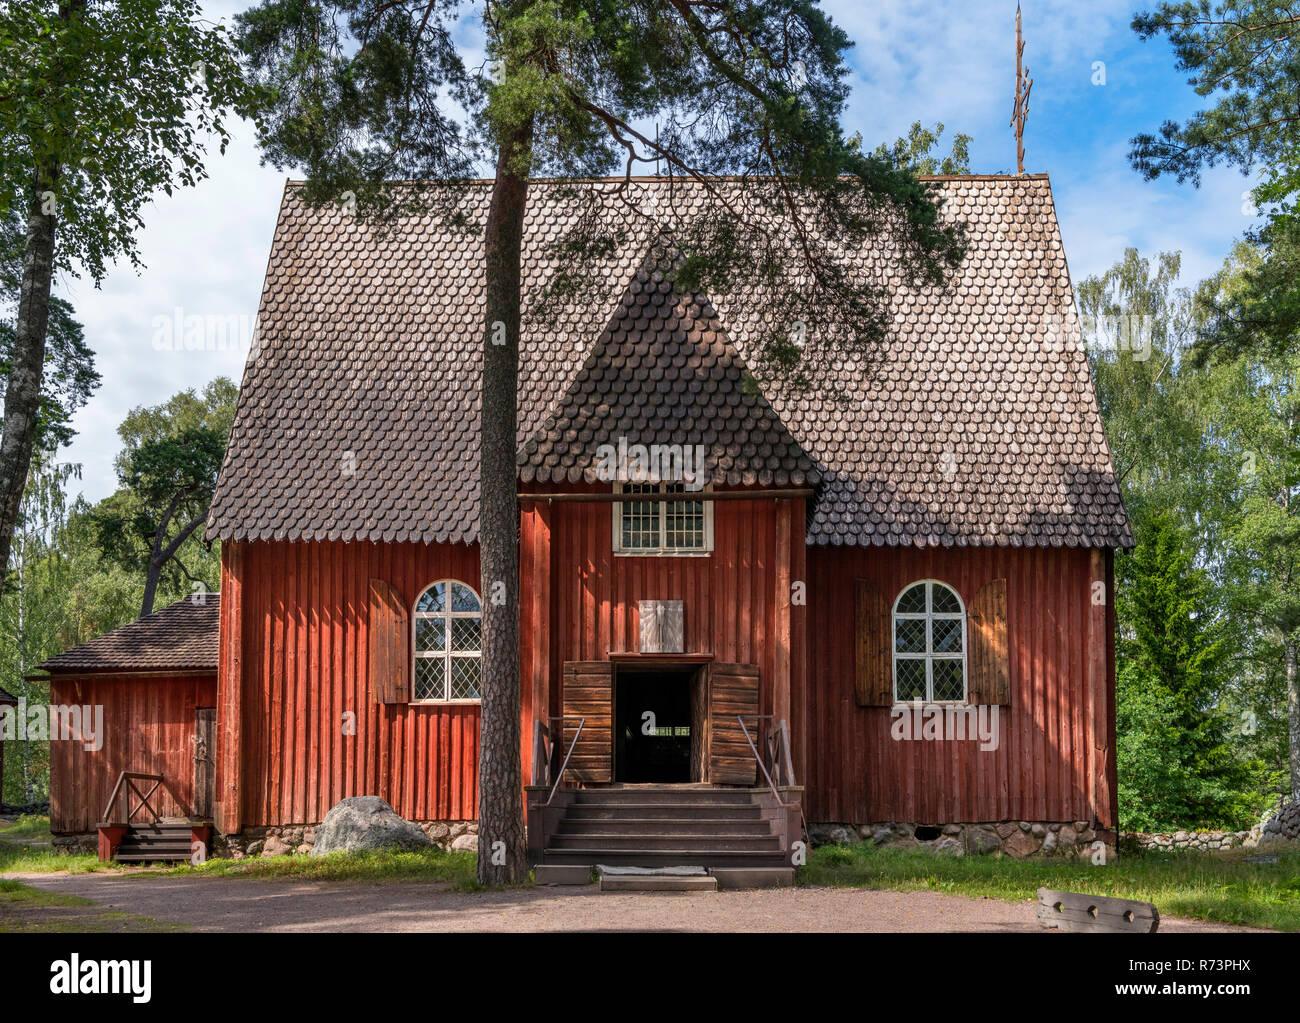 Late 17th century Karuna Church (from Sauvo, Southwest Finland), Seurasaari Open-Air Museum, Seurasaari, Helsinki, Finland. - Stock Image